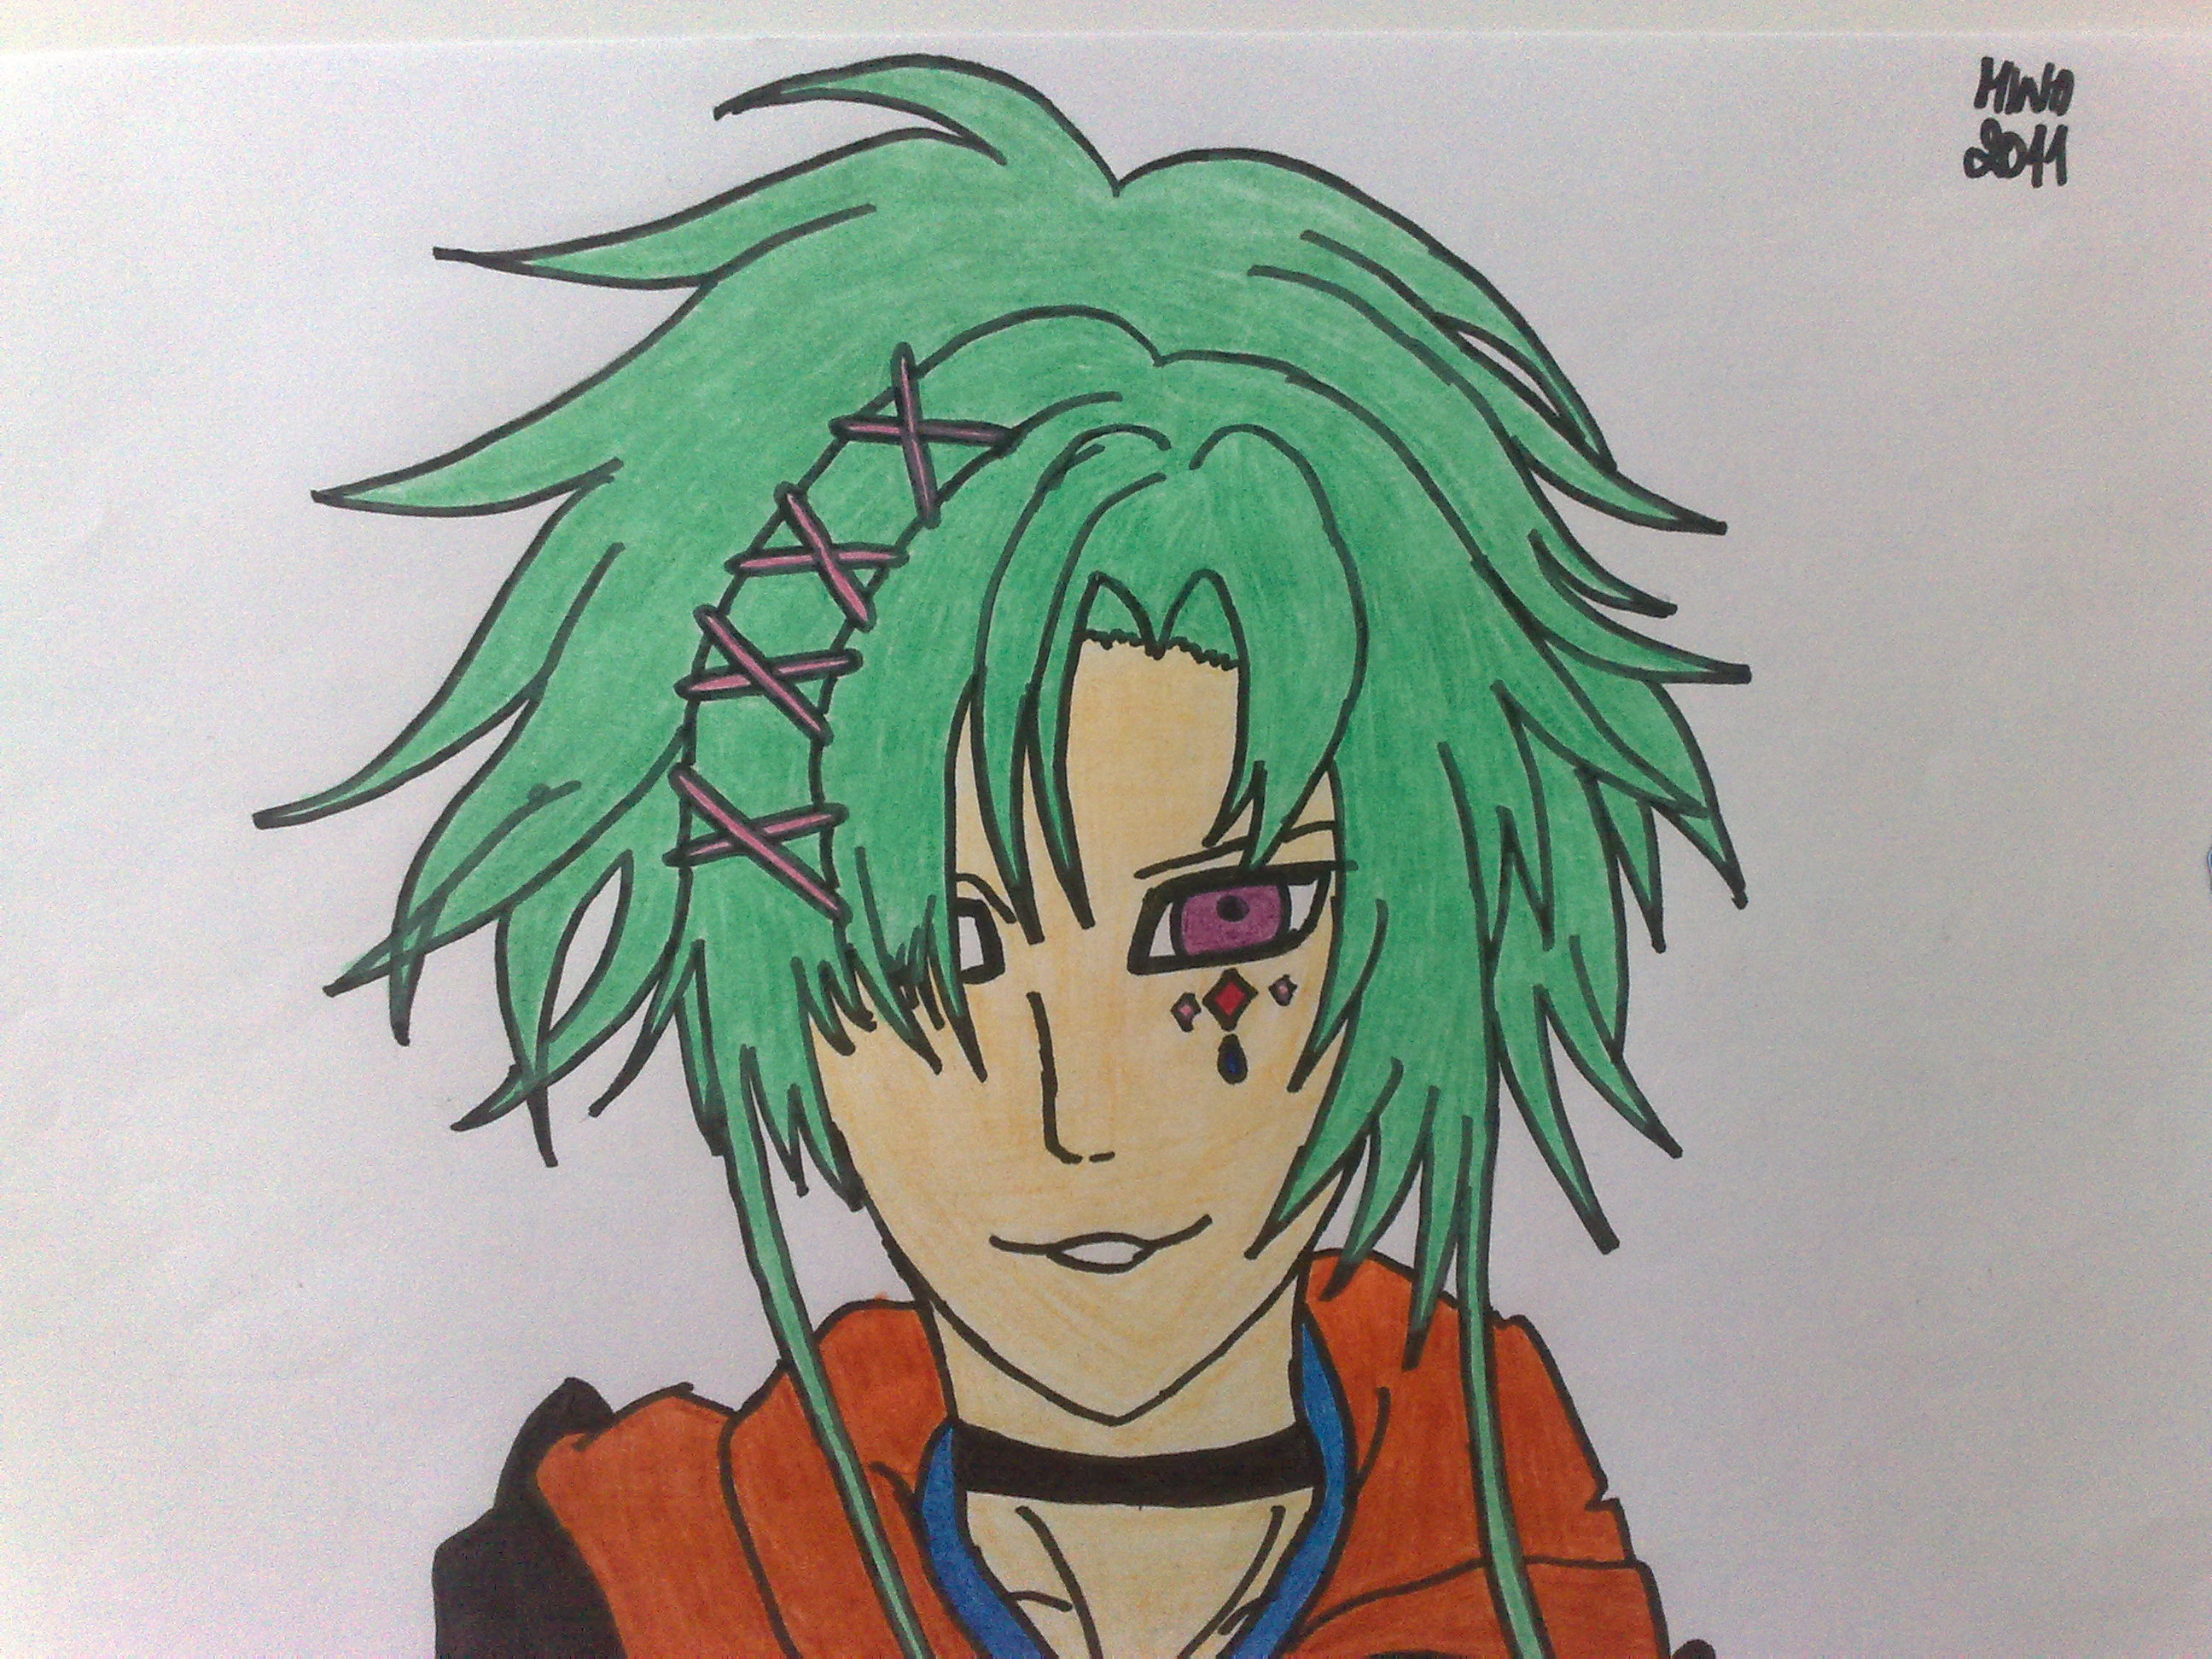 Boy With Green Hair By Gaarinka On Deviantart